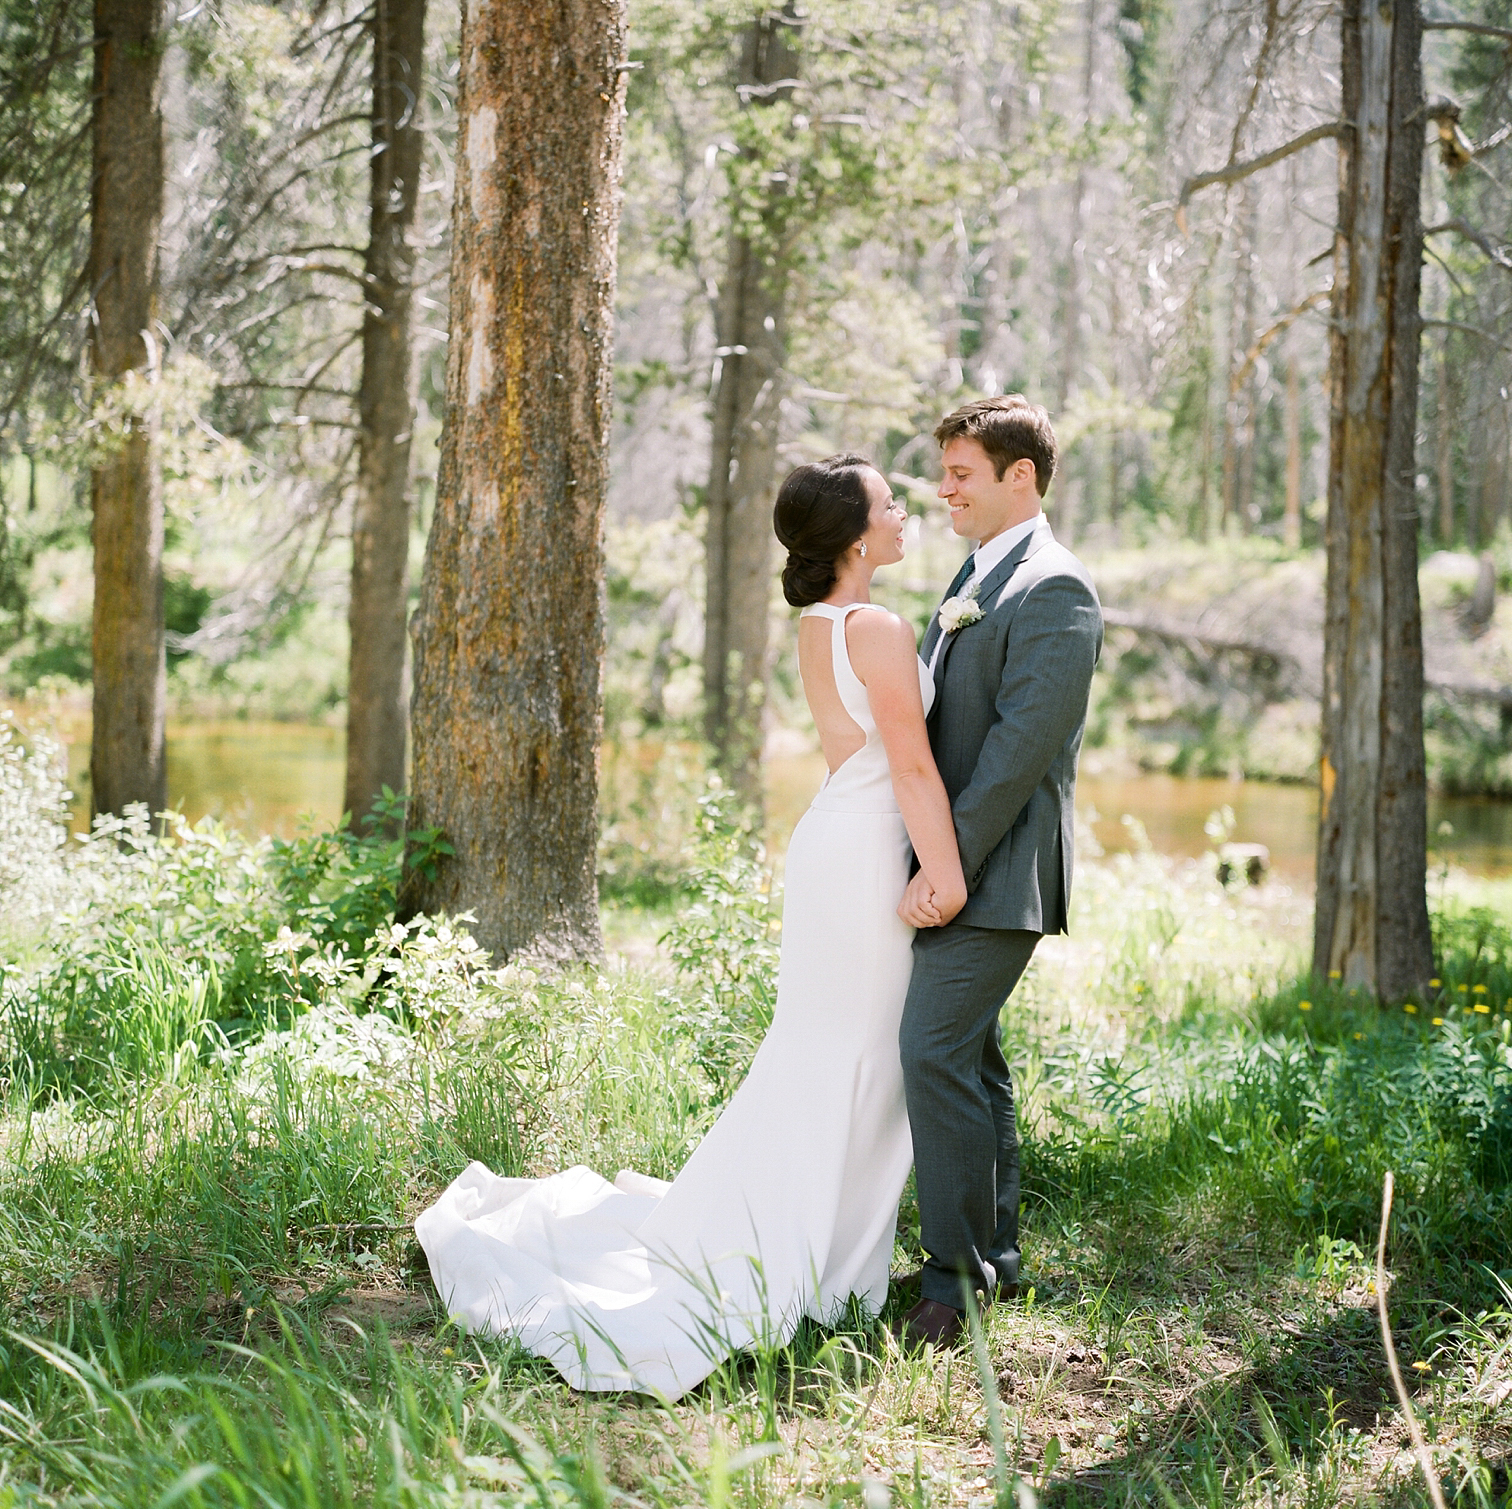 Vail Colorado Wedding, Colorado Wedding Photographer, Film Photographer, Mountain Wedding, Colorado Destination Wedding Photographers, Best Photographers In Colorado, Film Photography, Denver Wedding Photographers, First Look, Danielle DeFiore Photography